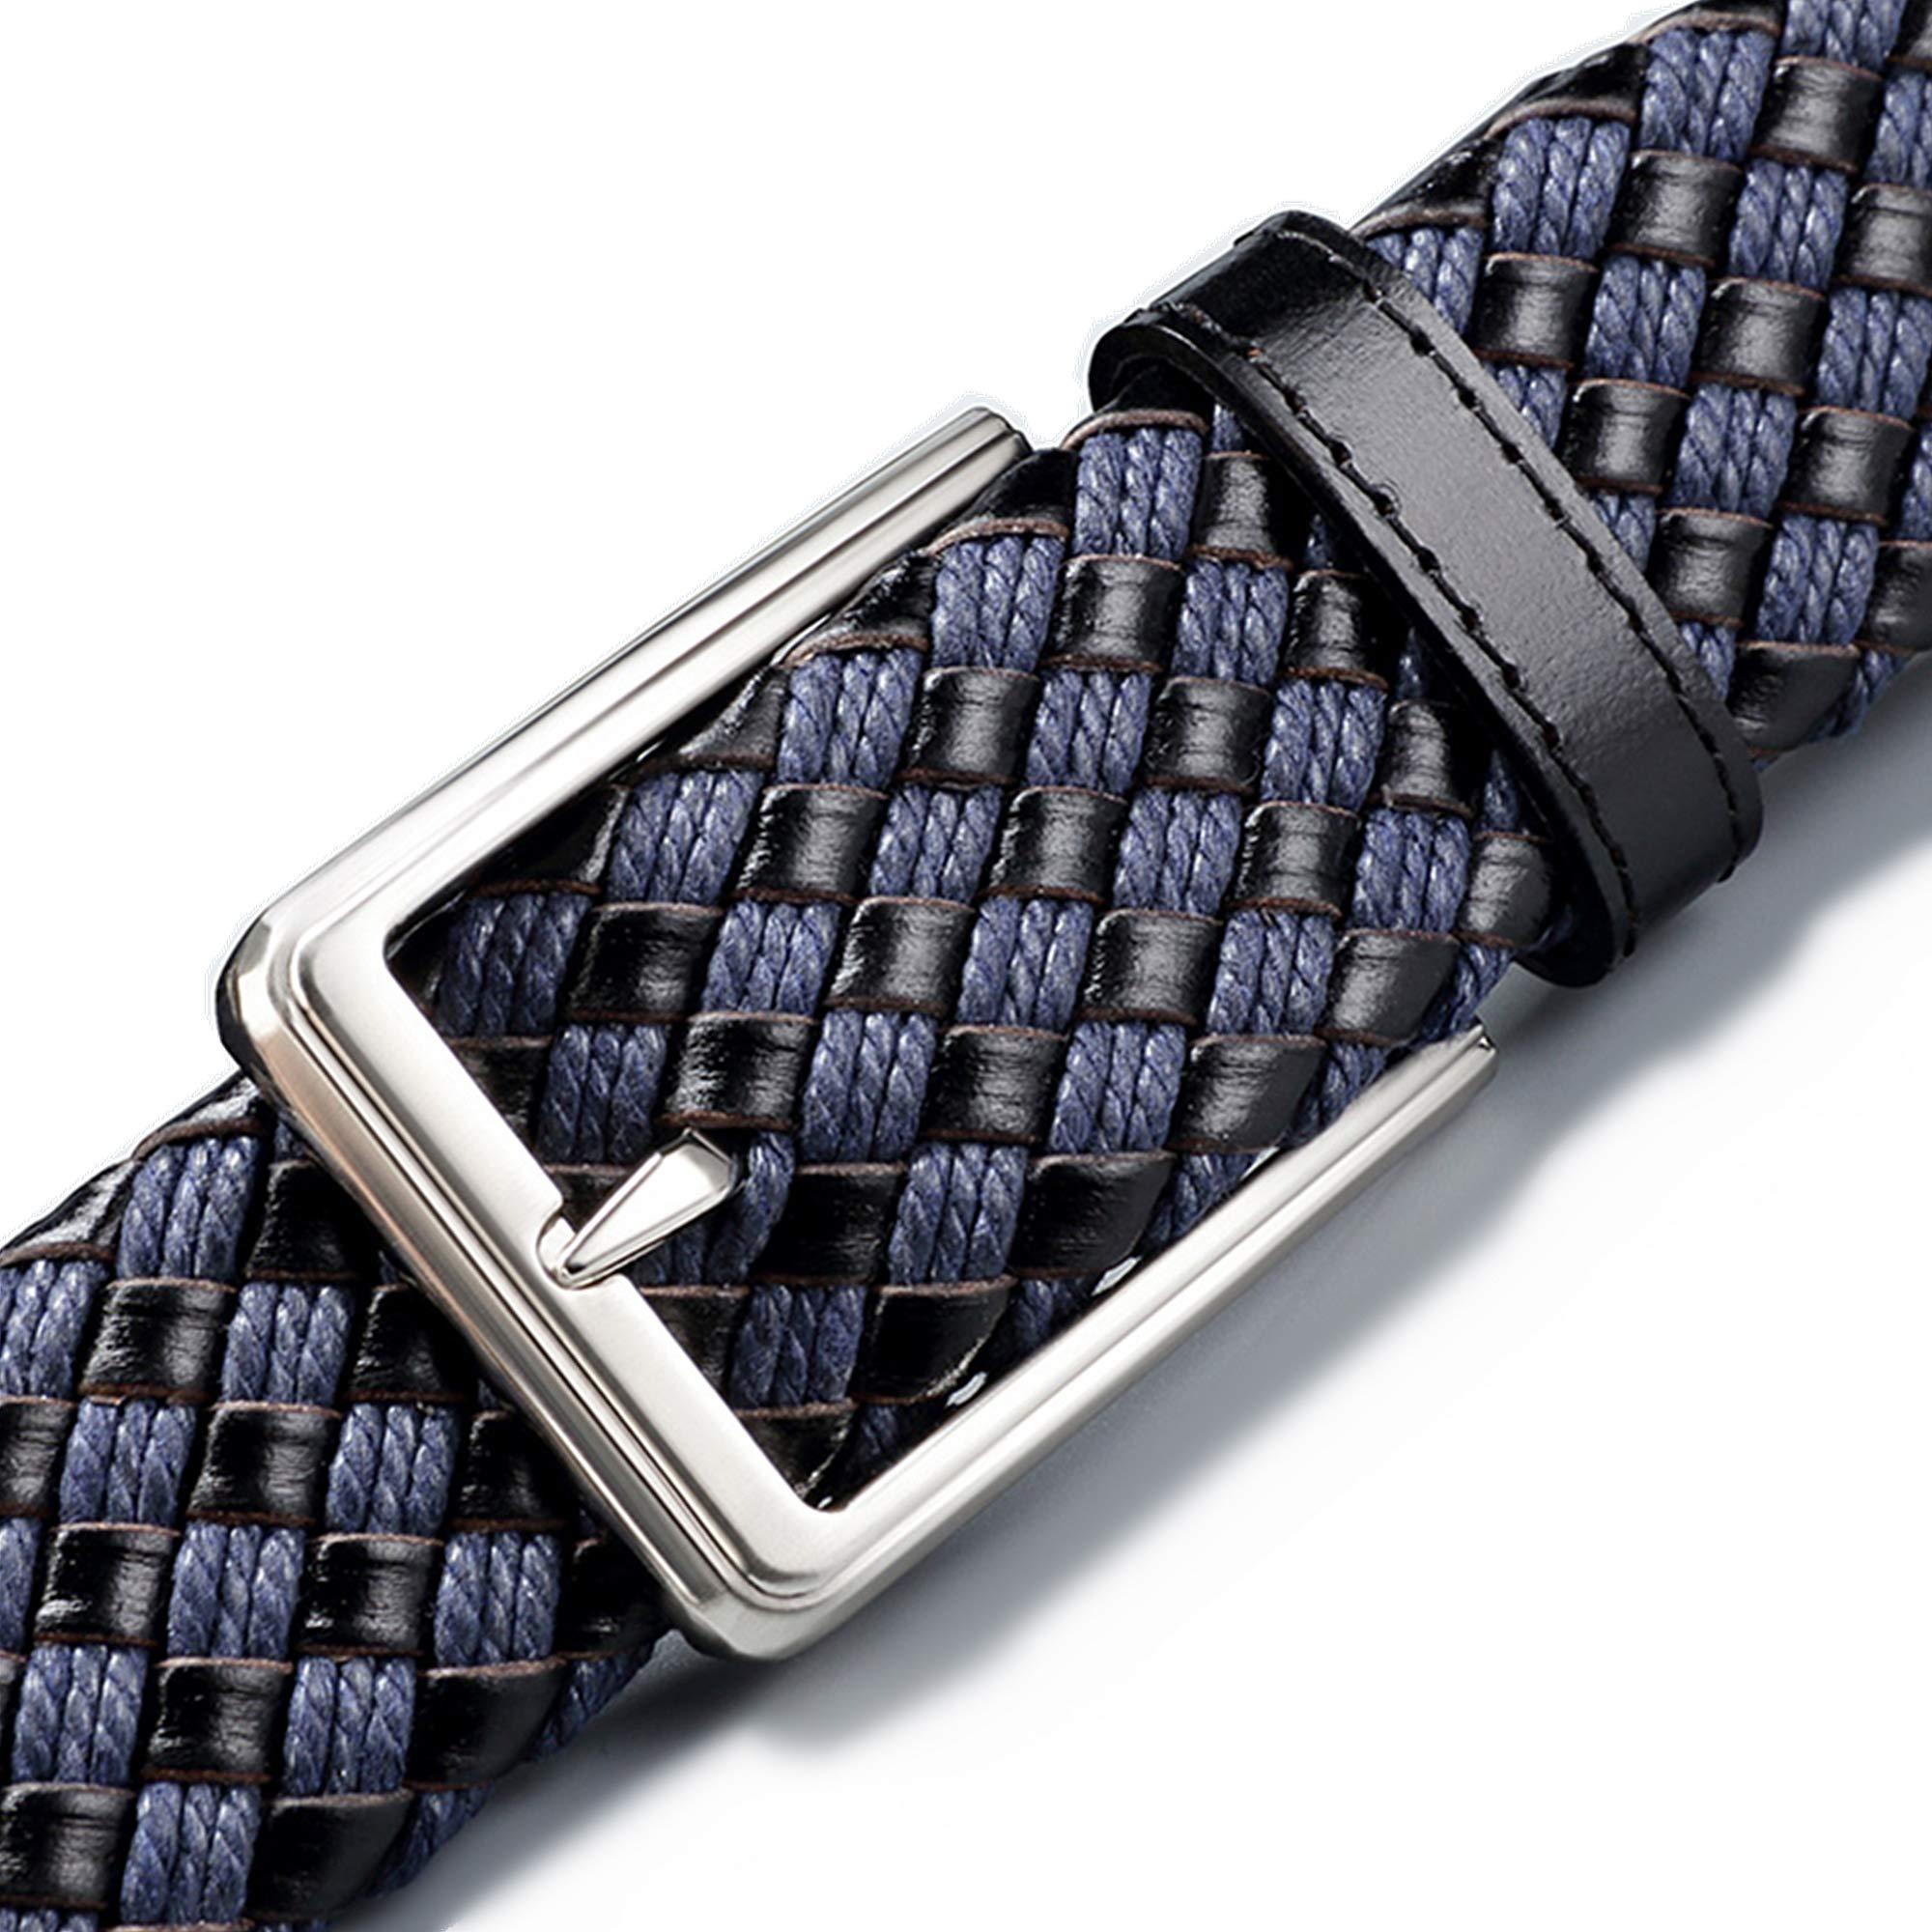 Braided Belts for Men Leather Woven designer belts blue Plaid running belt for women(small)